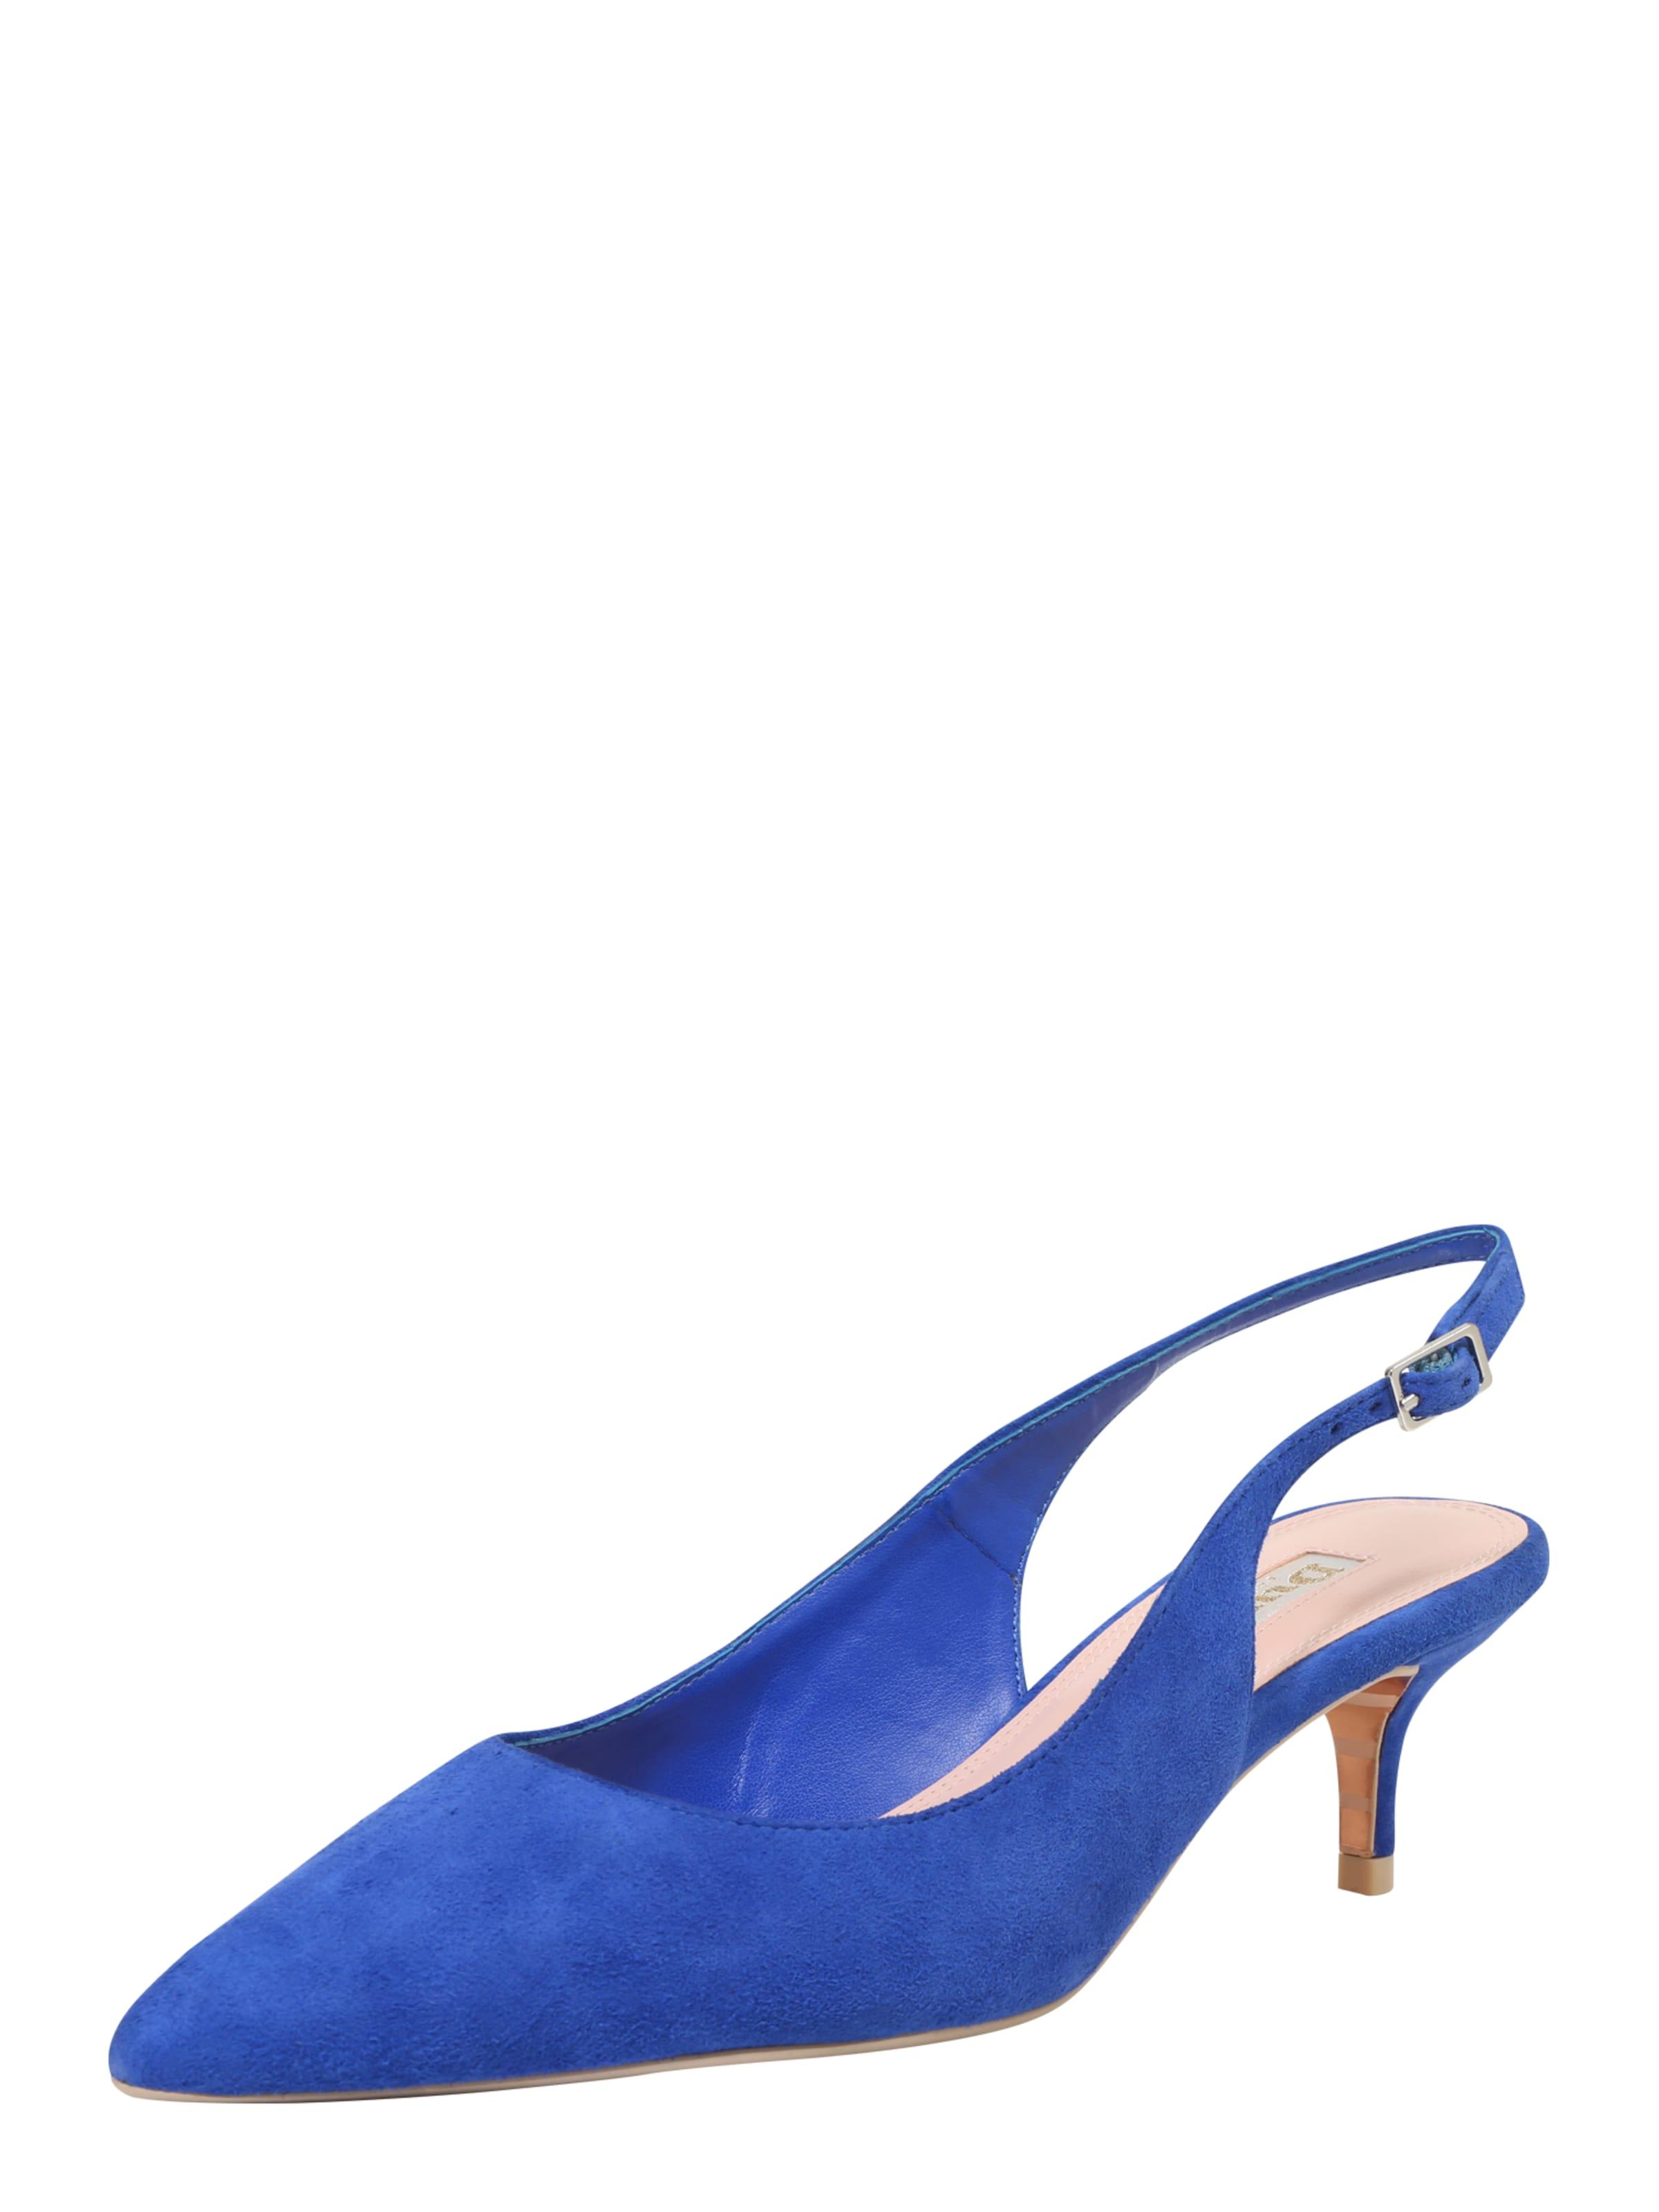 Bleu Dune Pompes Fronde London « Casandra » s5kOpkRiU1